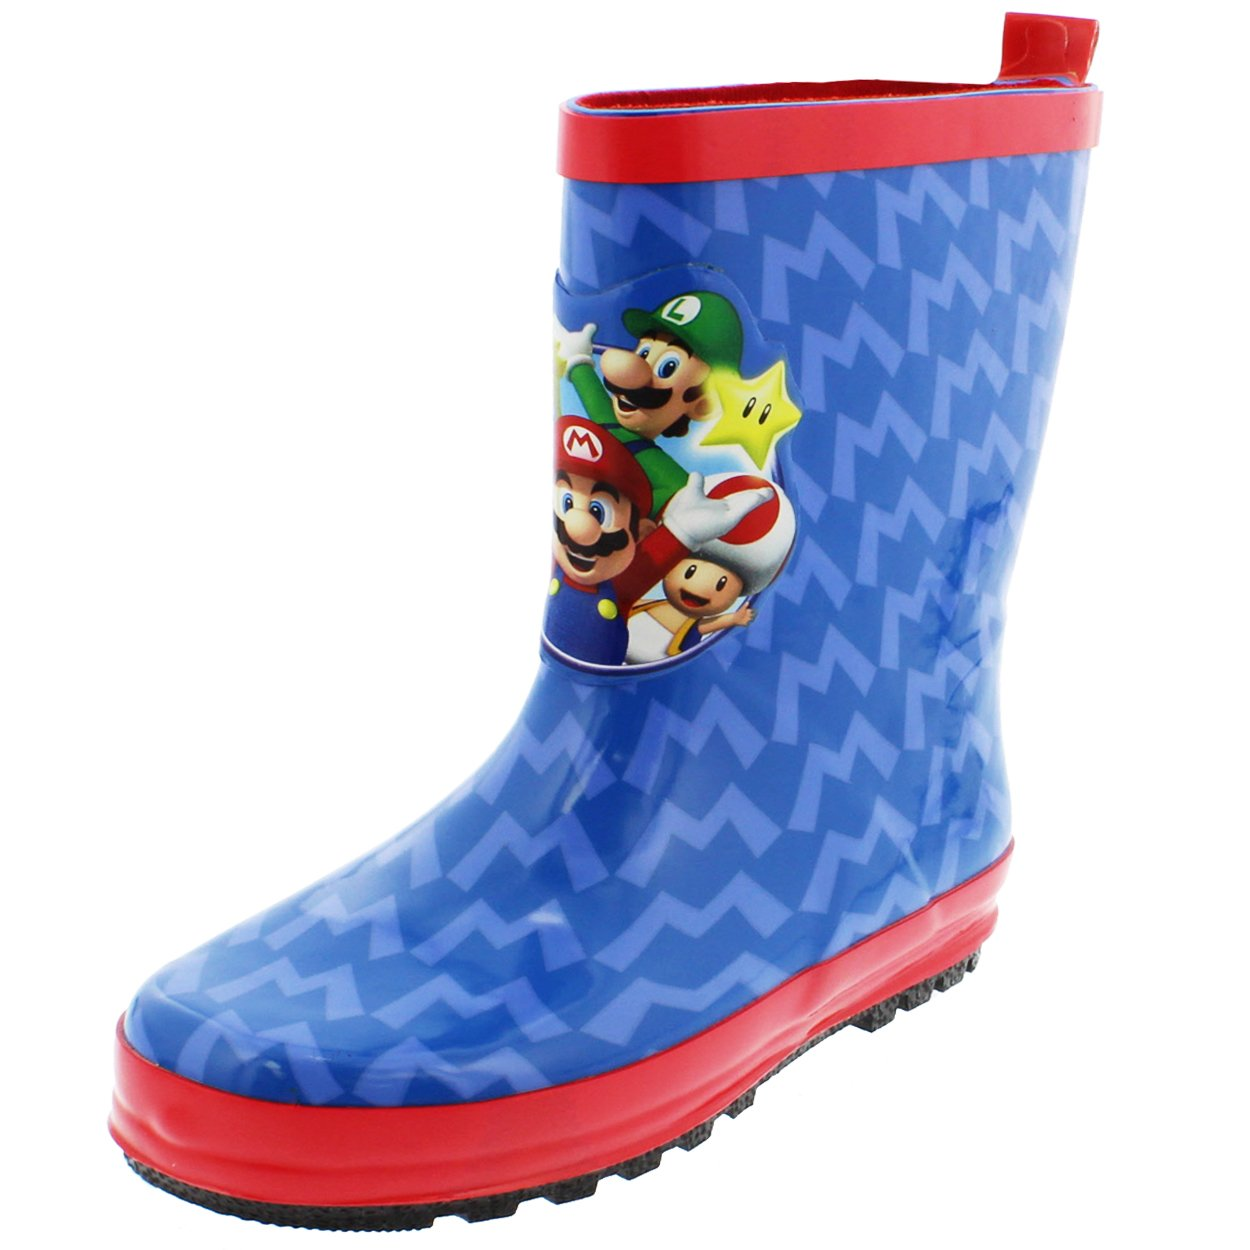 Super Mario Brothers Boys Rain Boots (Little Kid/Big Kid) Super Mario Blue) manufacturer